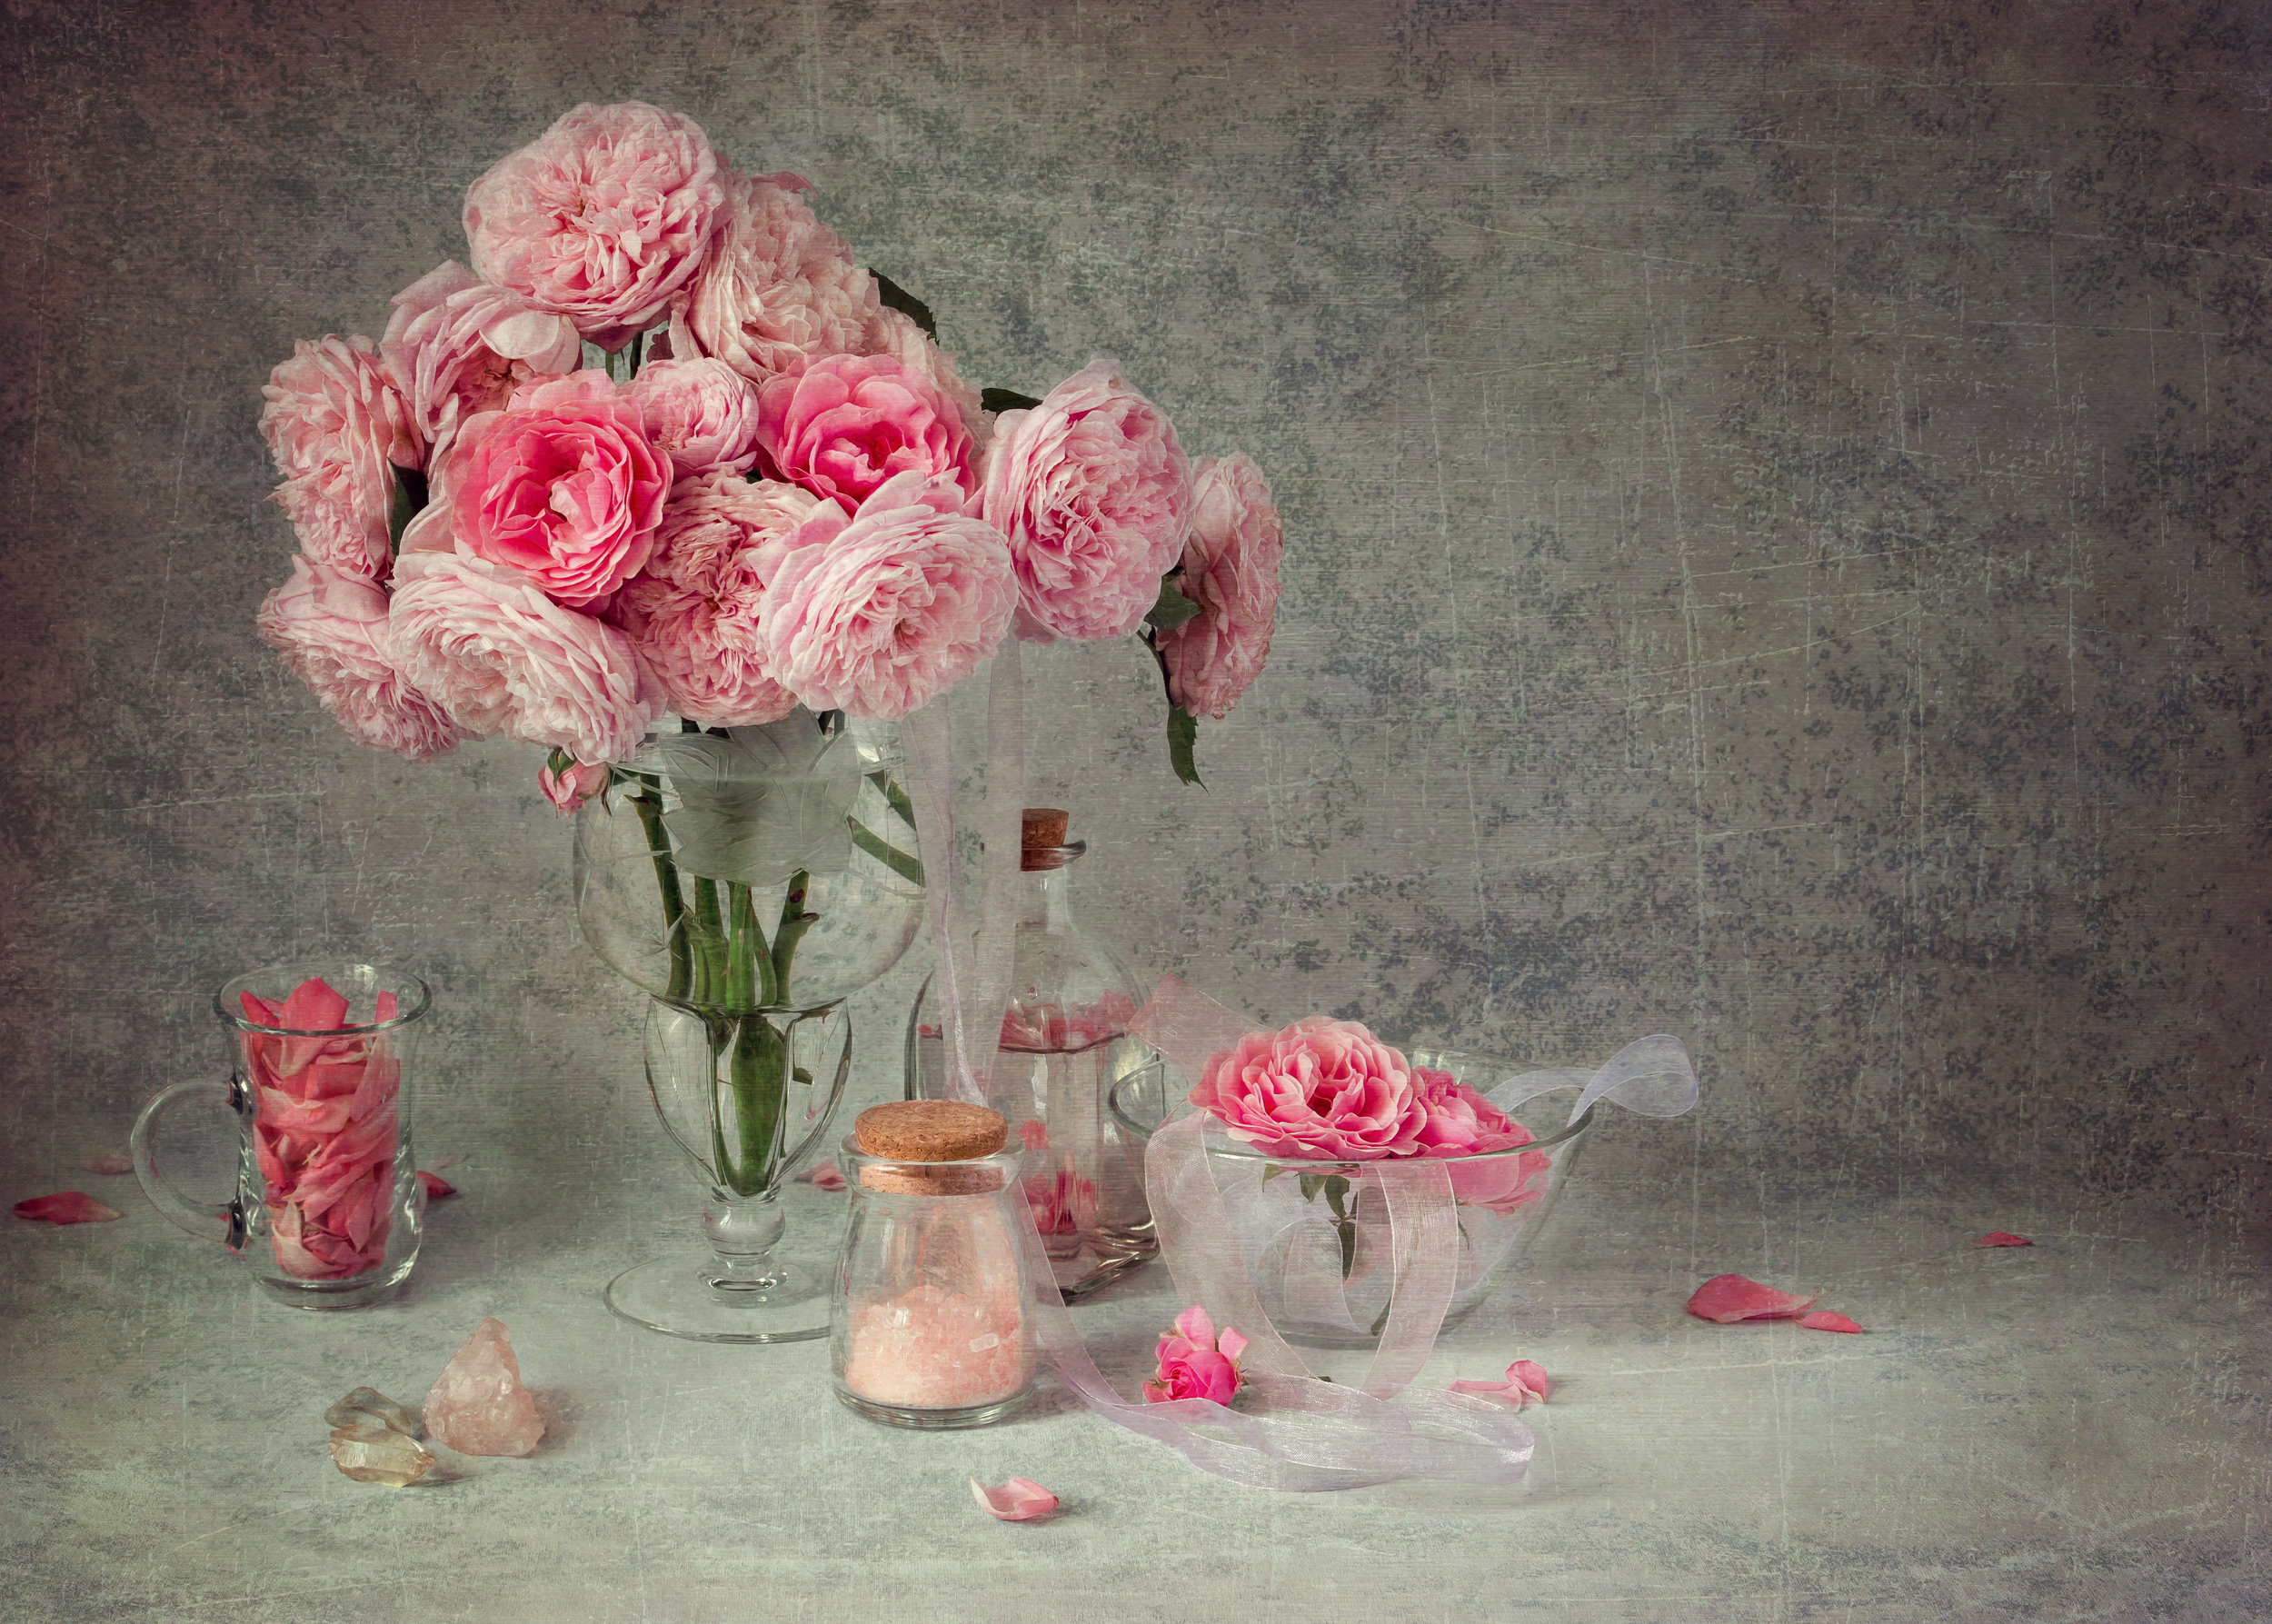 натюрморт, розы, цветы, винтаж, шебби, Коцарева Ольга